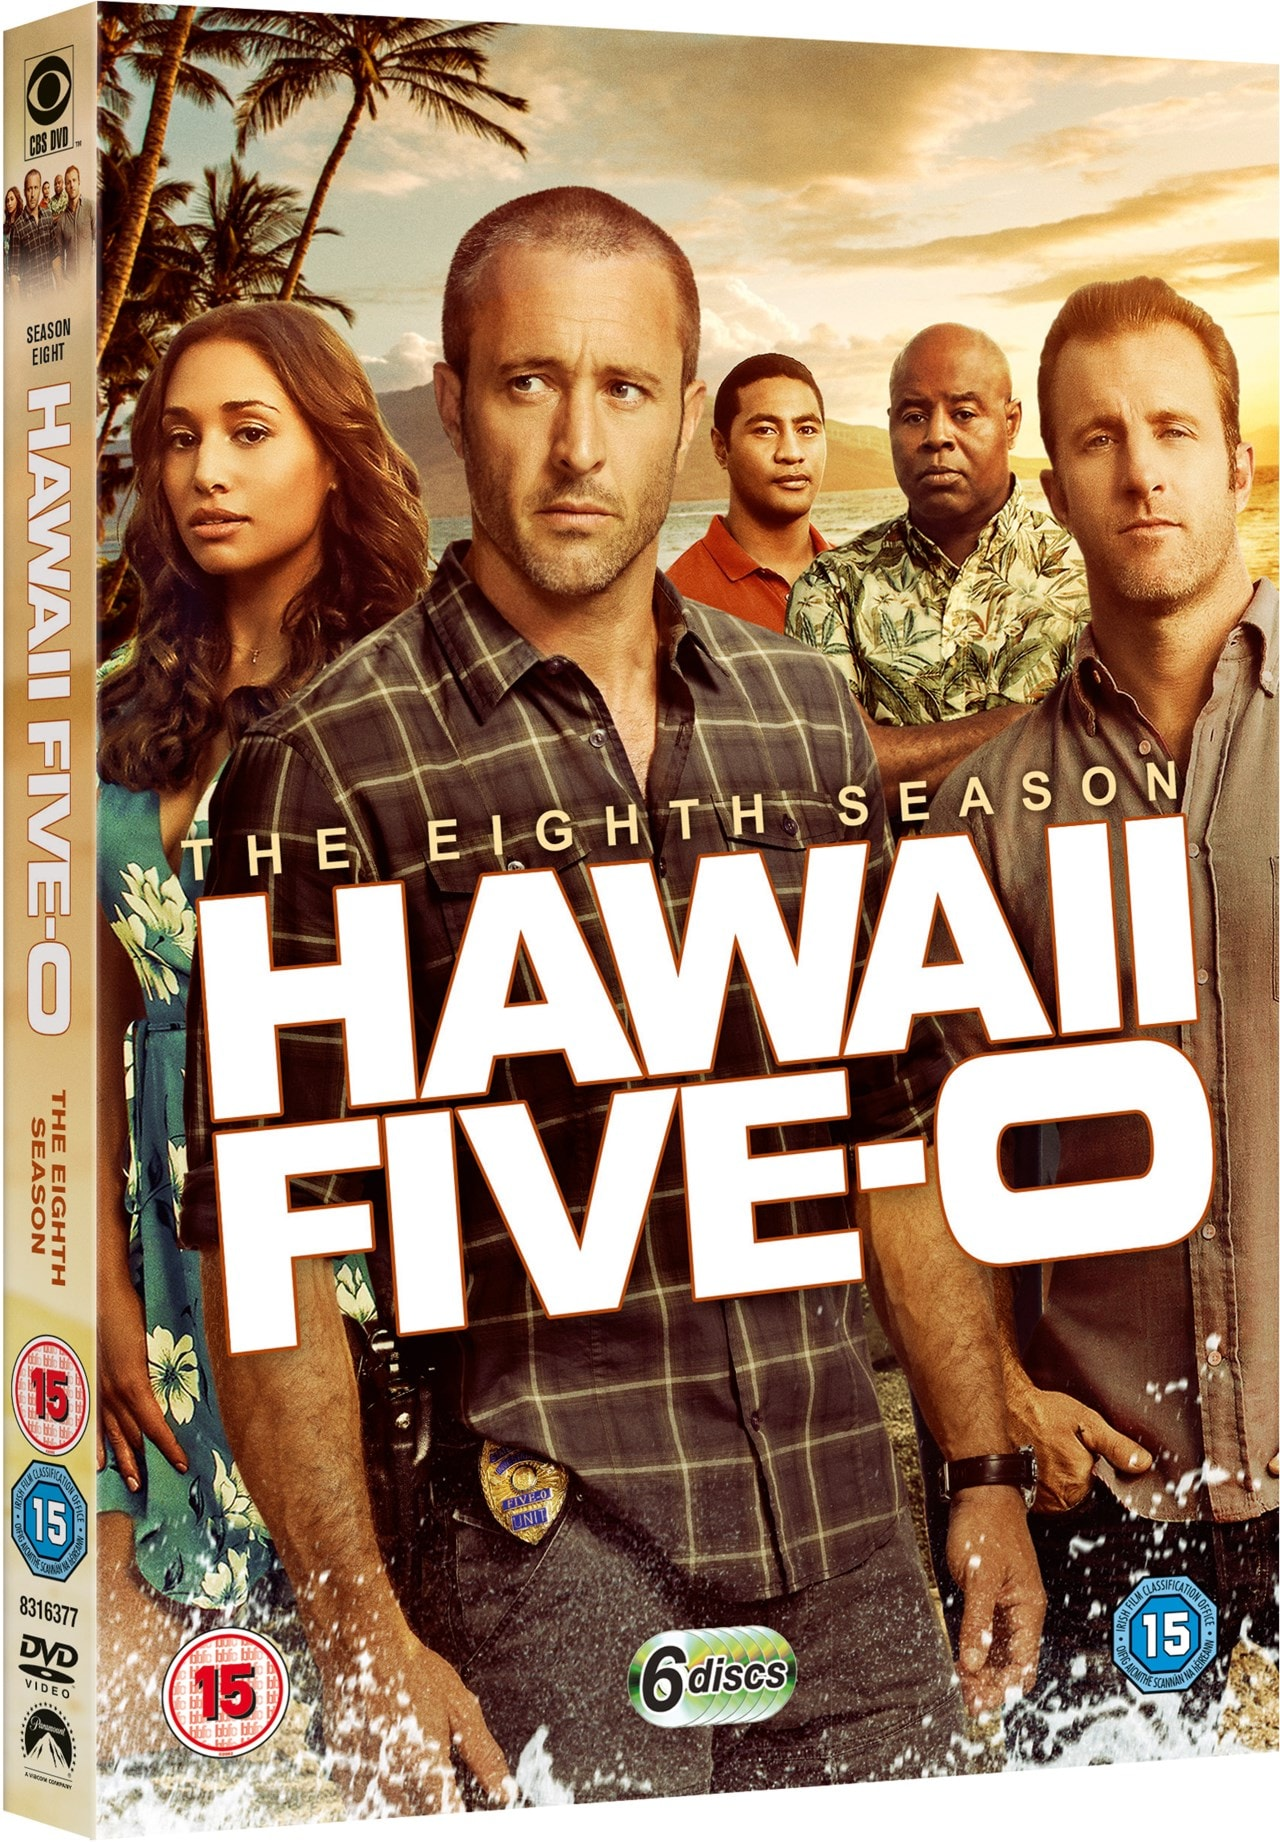 Hawaii Five-0: The Eighth Season - 2